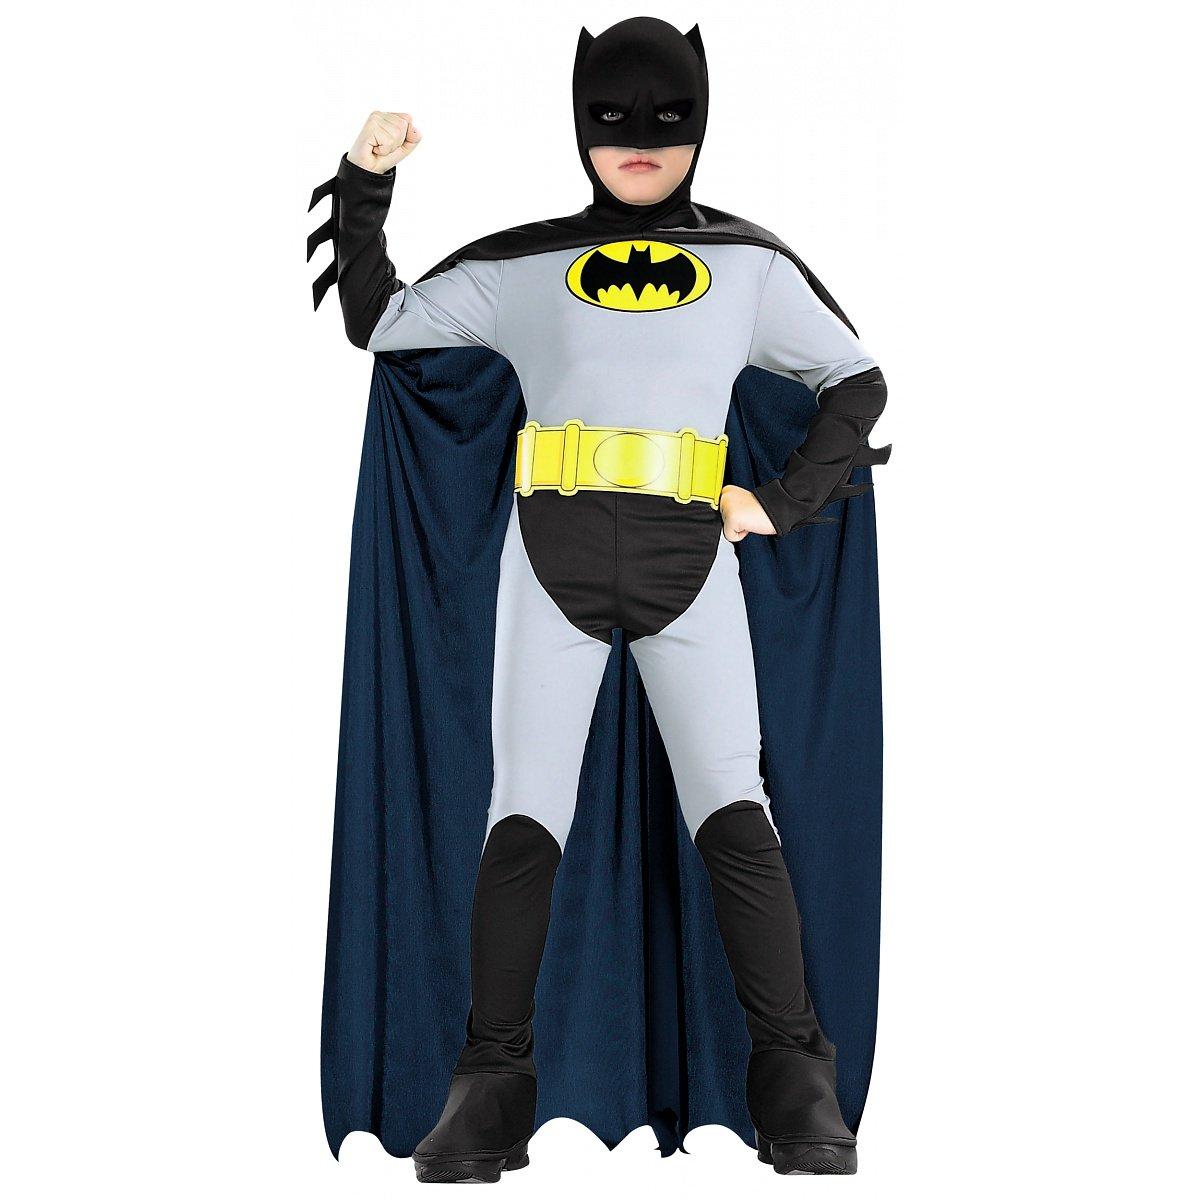 Amazon.com Batman Classic Halloween Costume Children-USA Size 4-6 (Ages 3-4) Clothing  sc 1 st  Amazon.com & Amazon.com: Batman Classic Halloween Costume Children-USA Size 4-6 ...